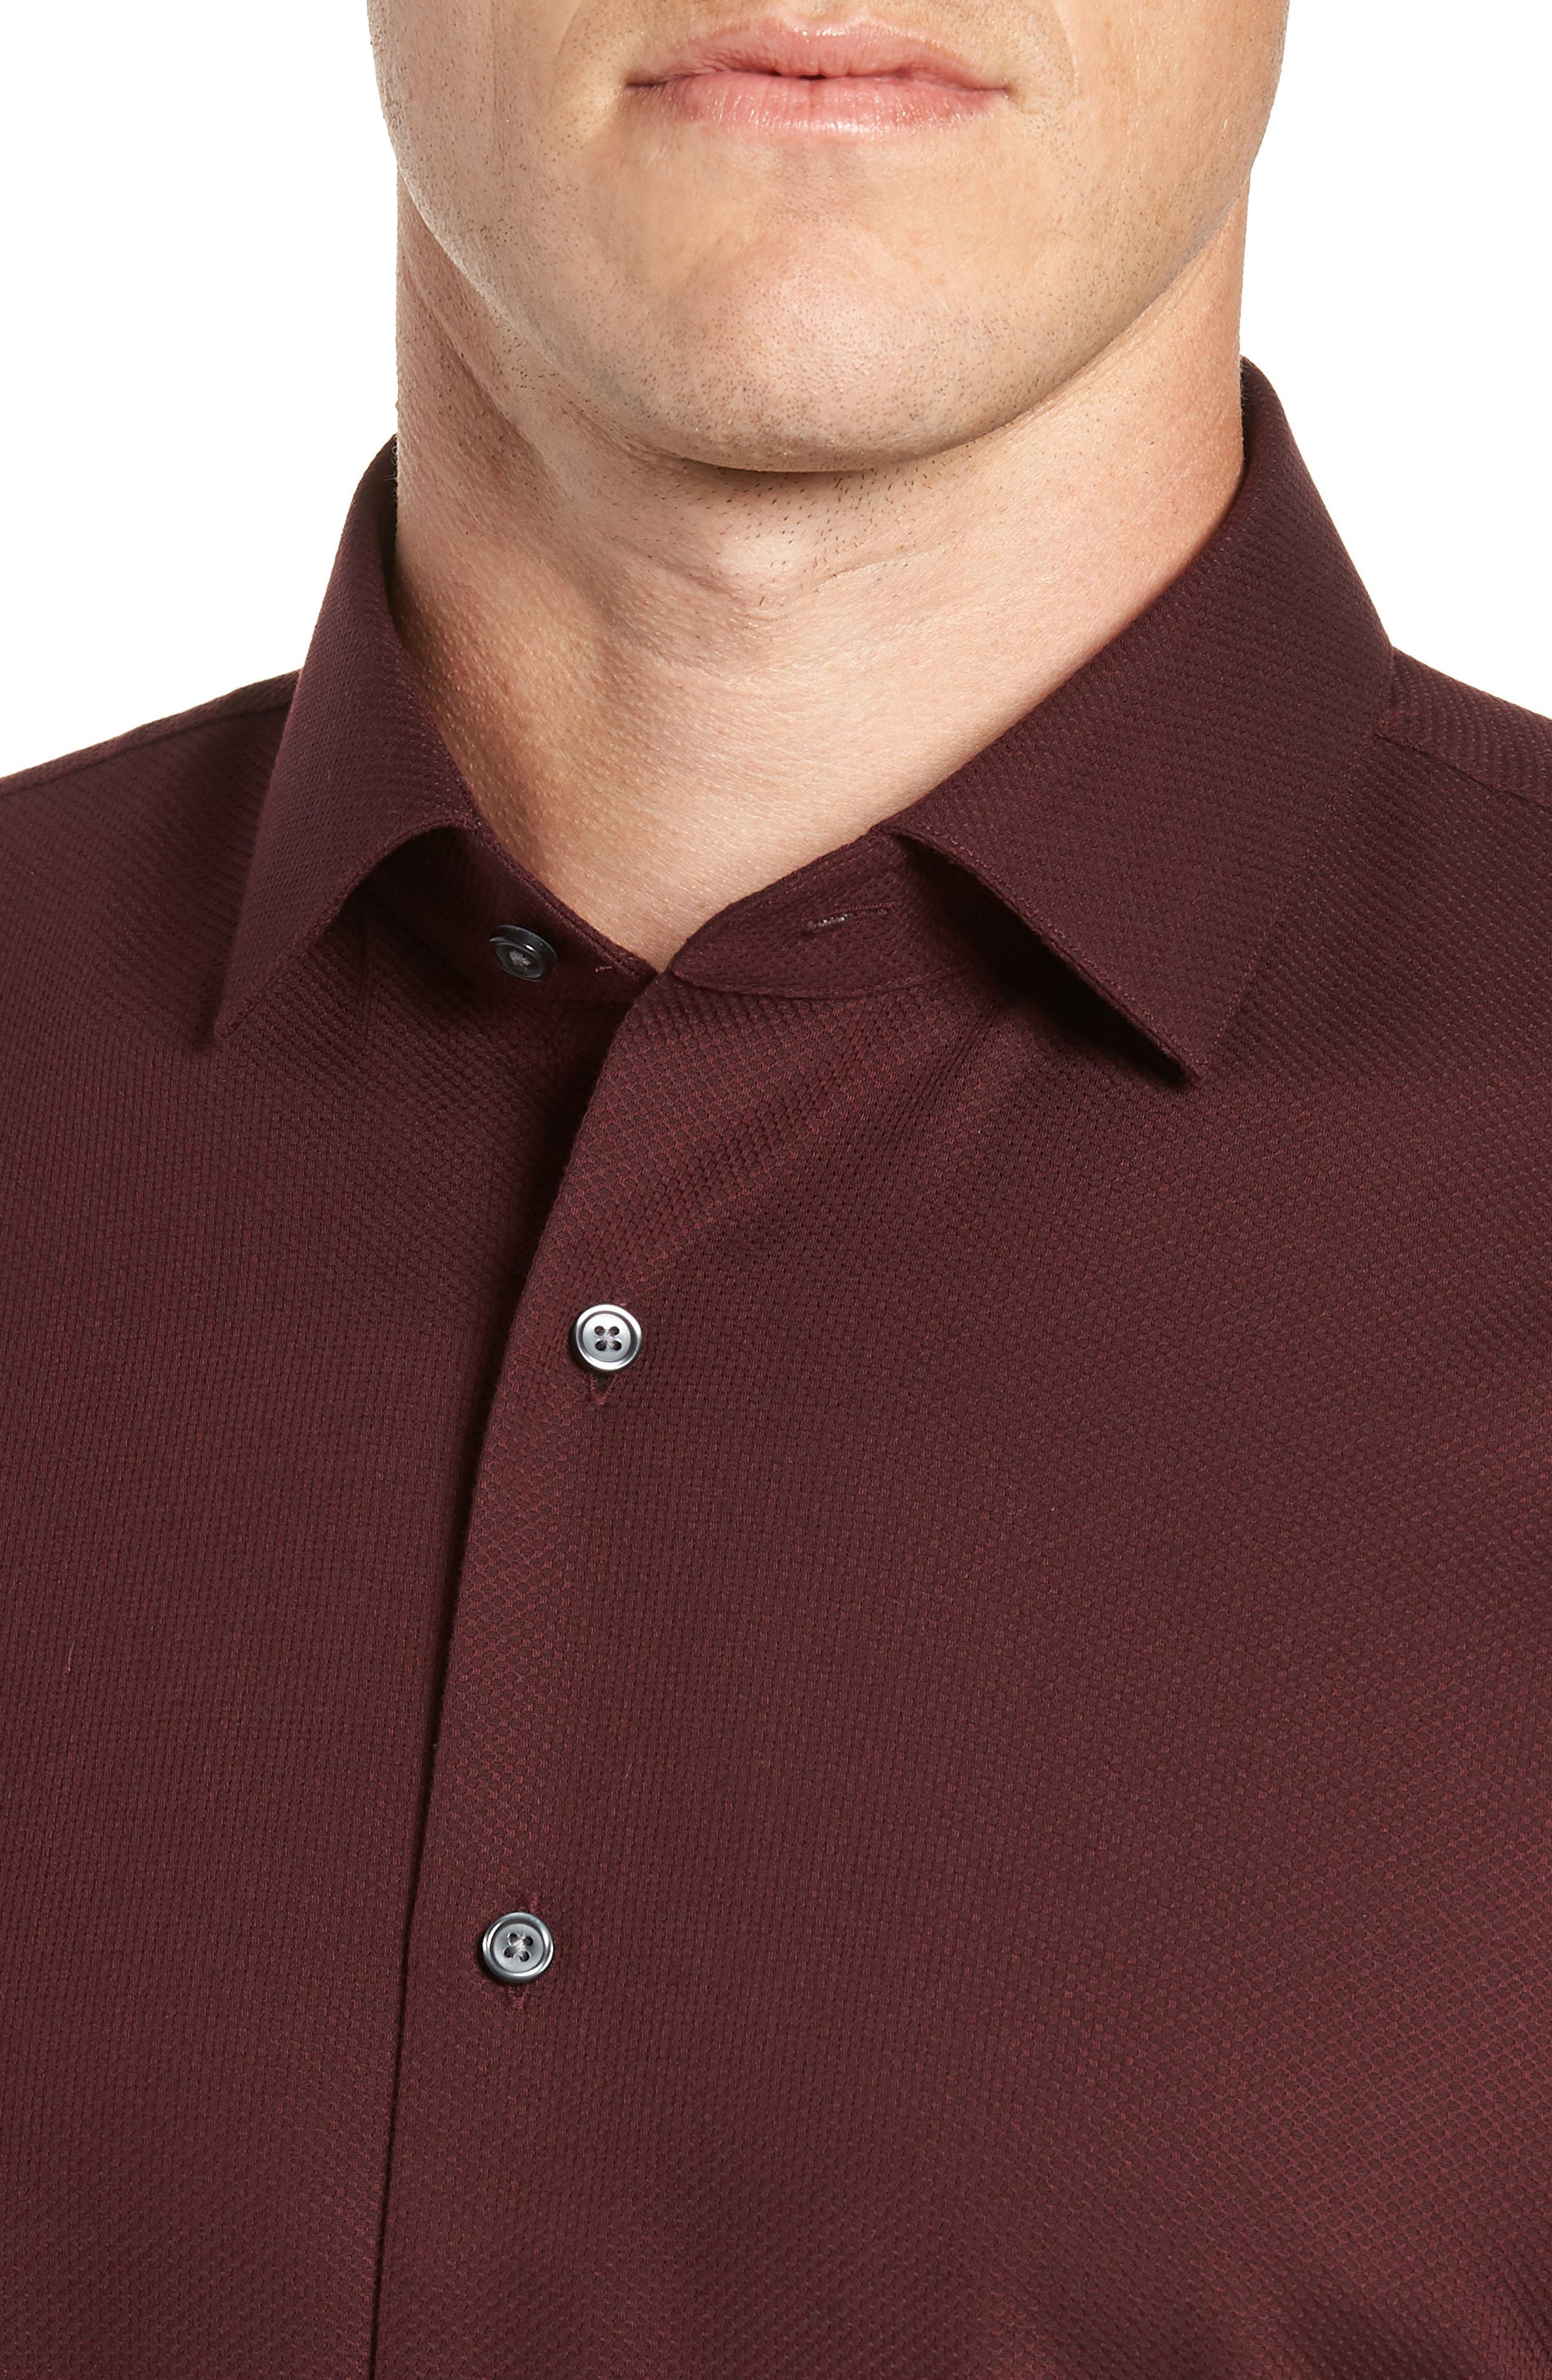 Trim Fit Non-Iron Solid Dress Shirt,                             Alternate thumbnail 2, color,                             BURGUNDY ROYALE